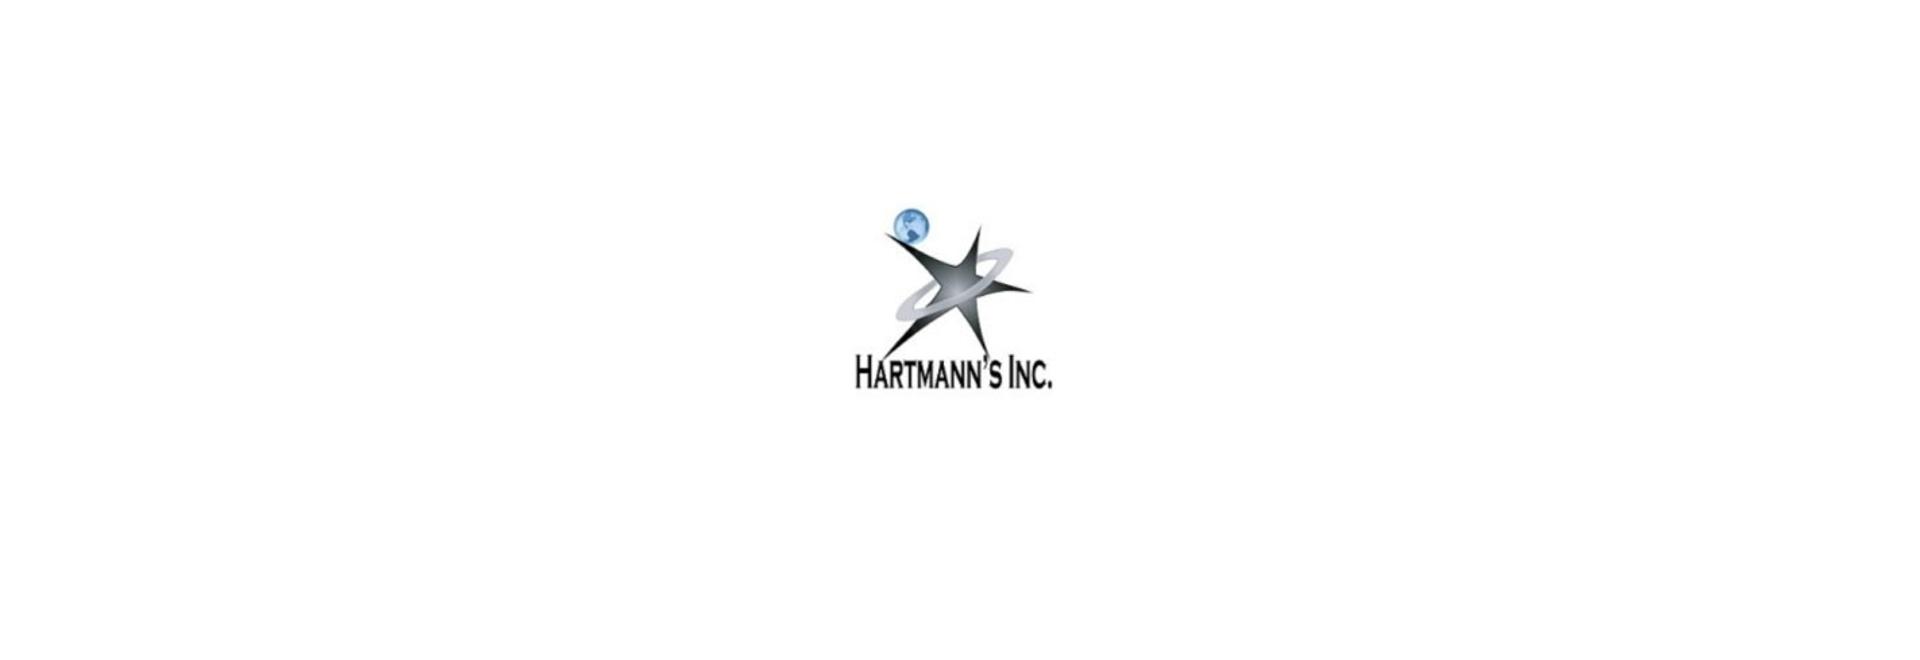 Hartmann's Inc. Logo